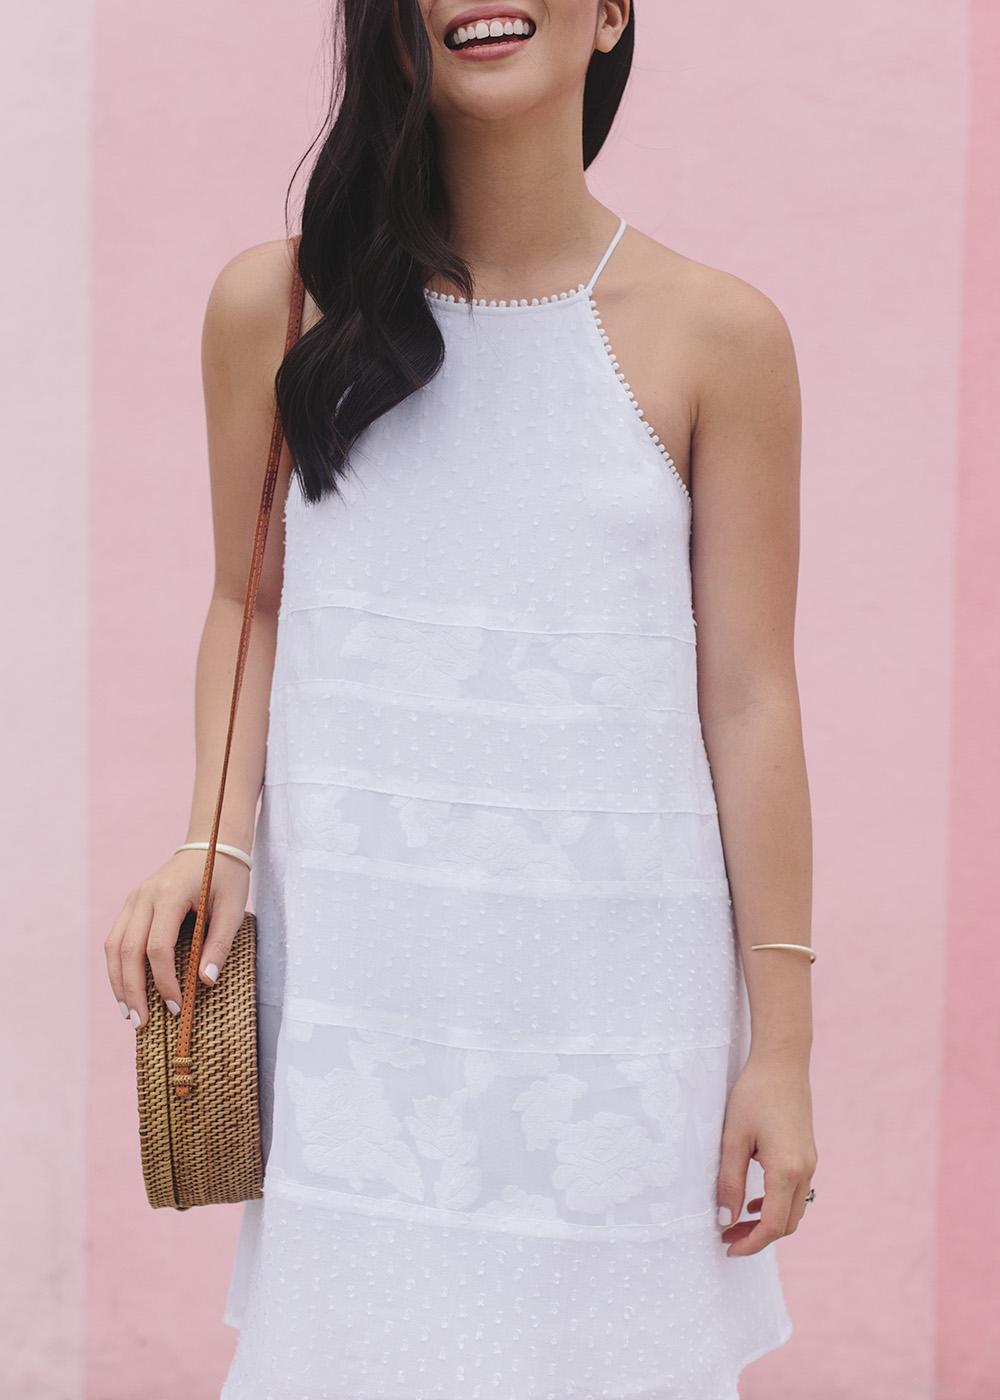 Summer Style Inspiration / White Swing Dress & Straw Circle Bag